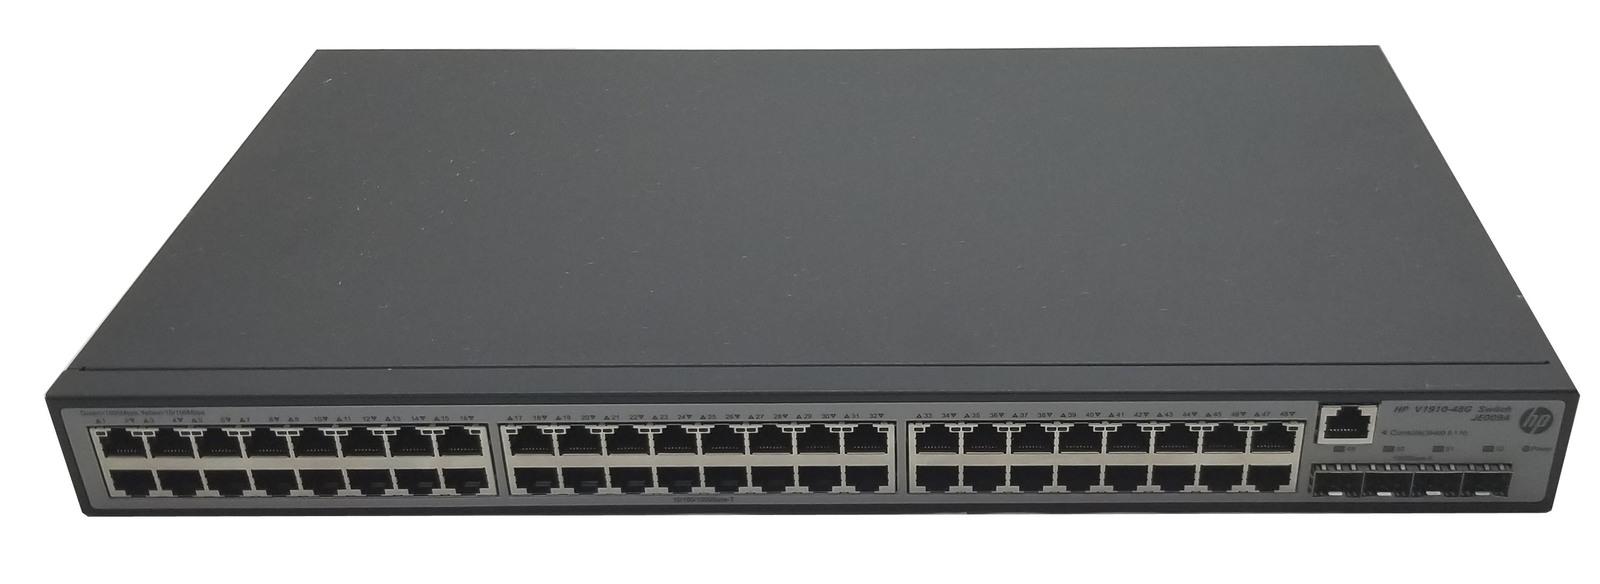 HP ProCurve Ethernet Switch V1910-48G JE009A 48x RJ-45 4x SFP 1U Bin:14